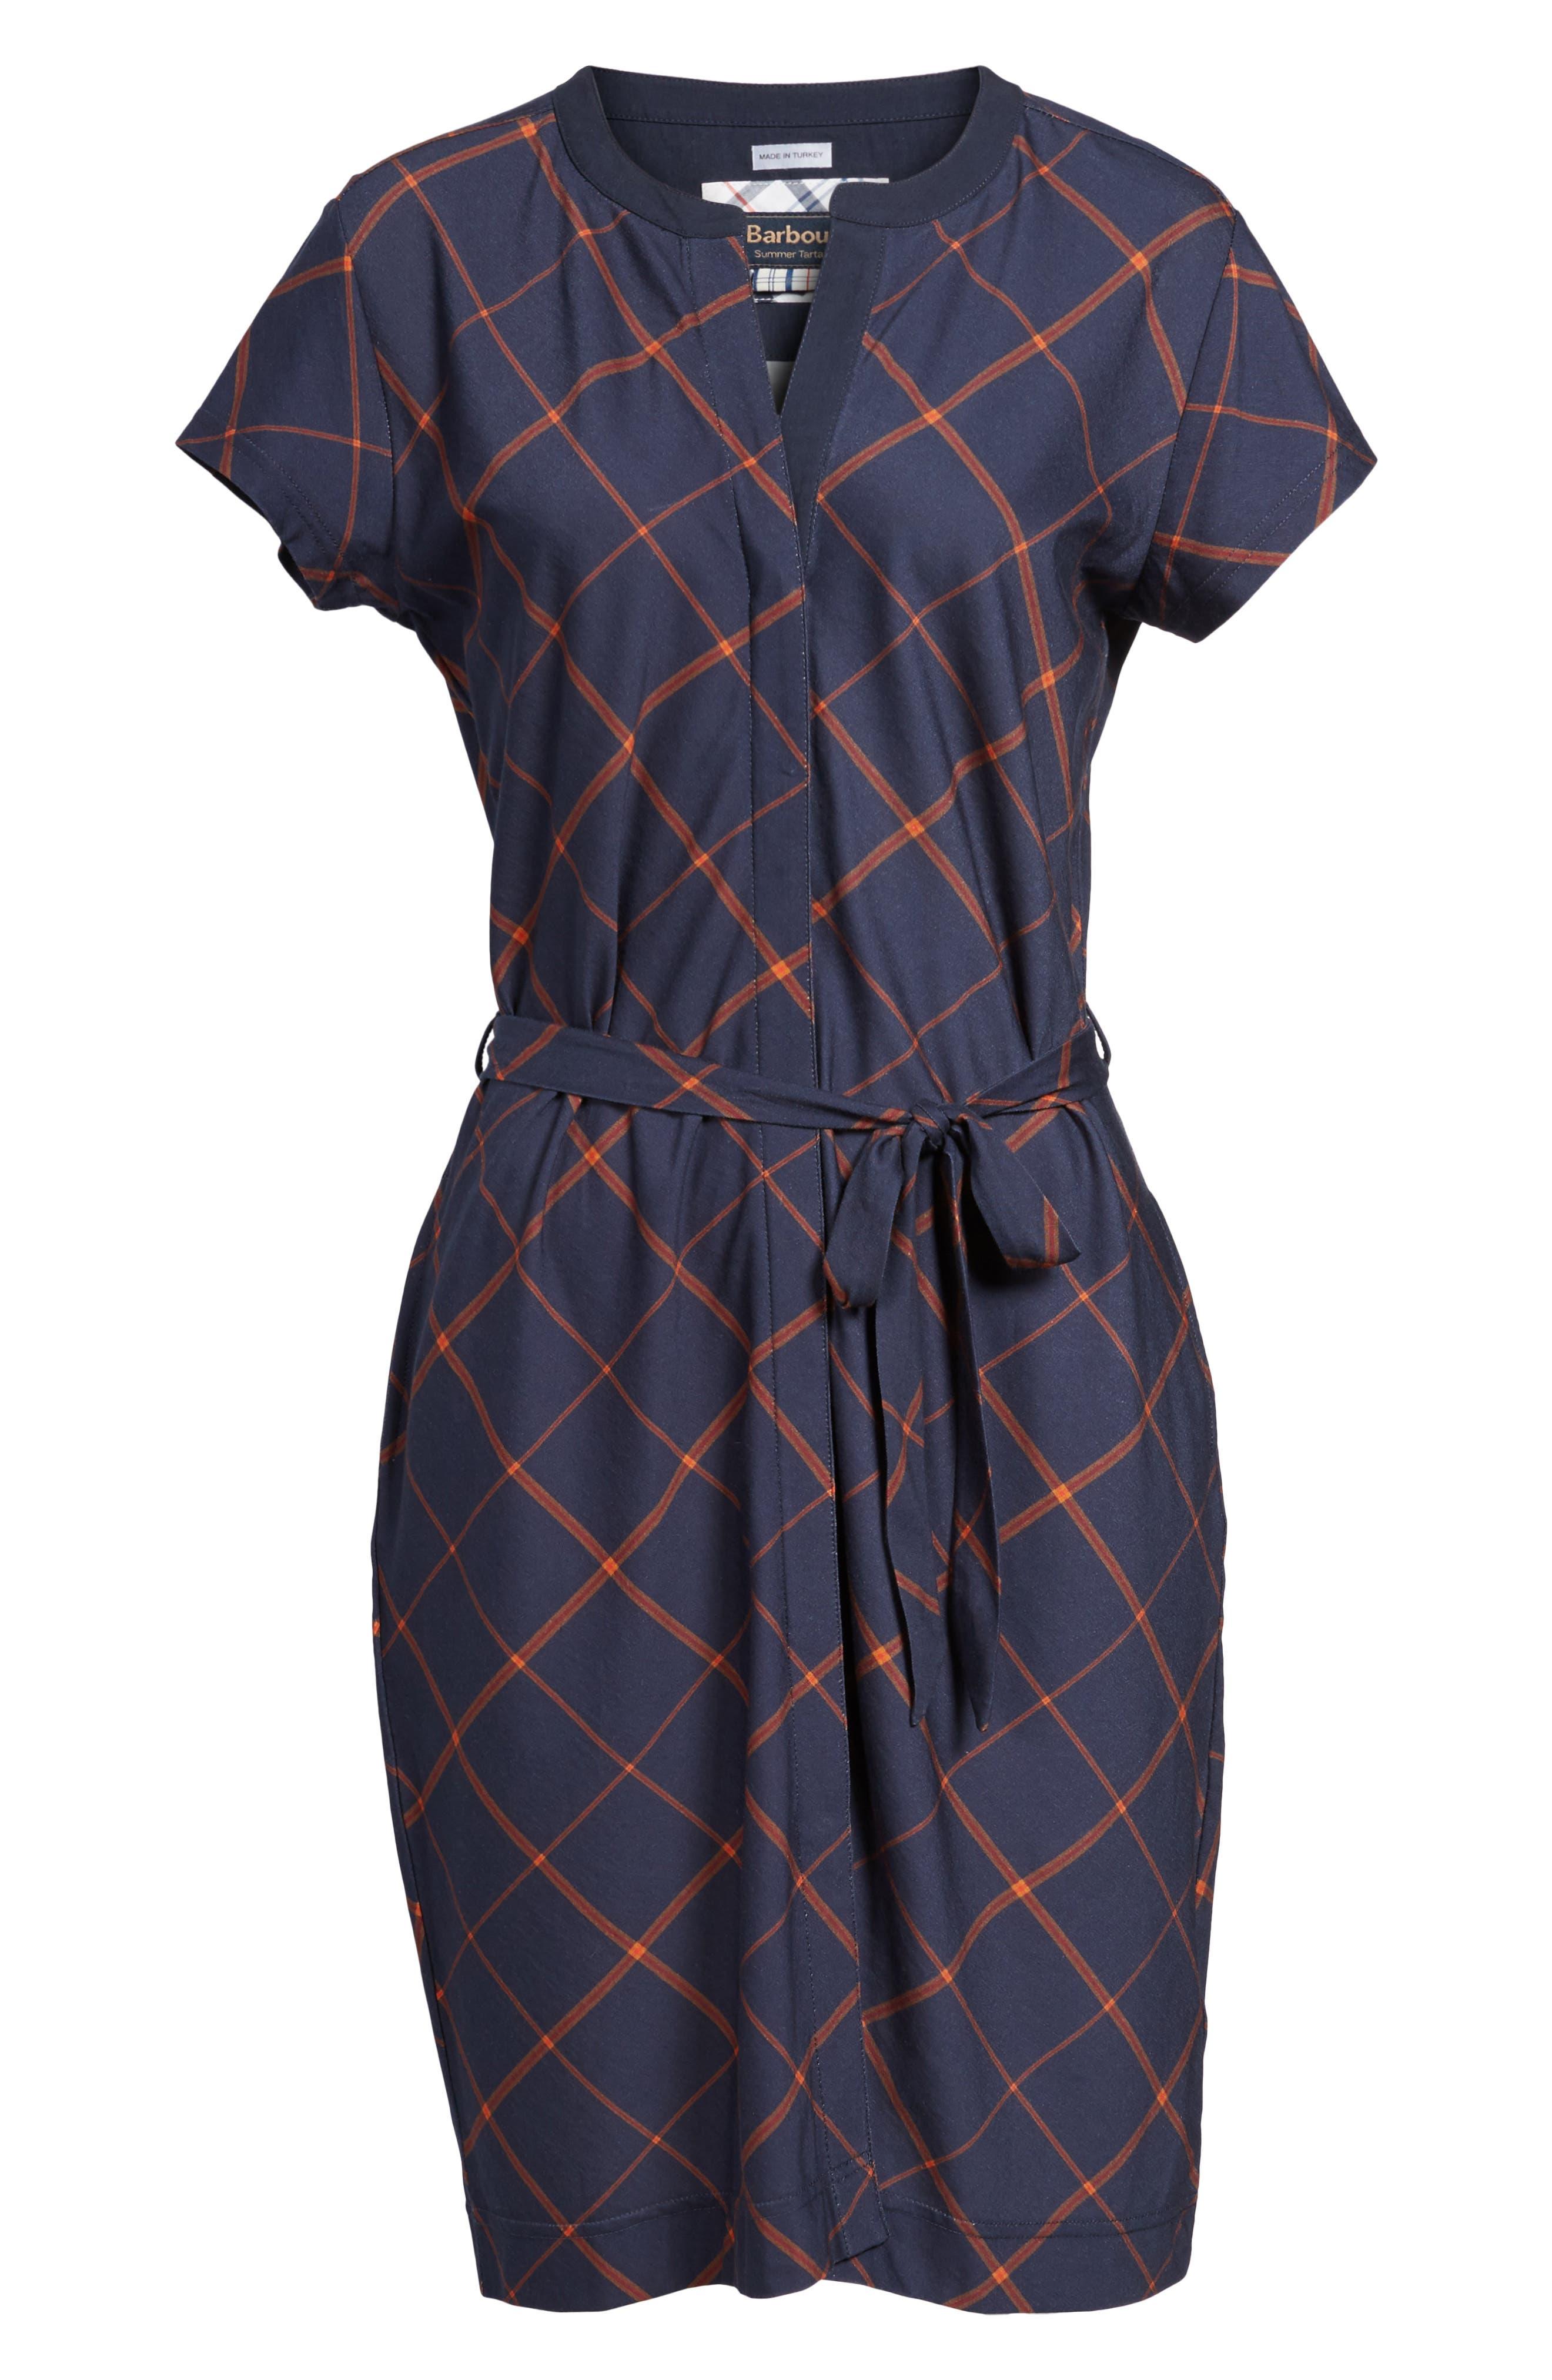 Glenrothes Windowpane Plaid Dress,                             Alternate thumbnail 6, color,                             Navy Check